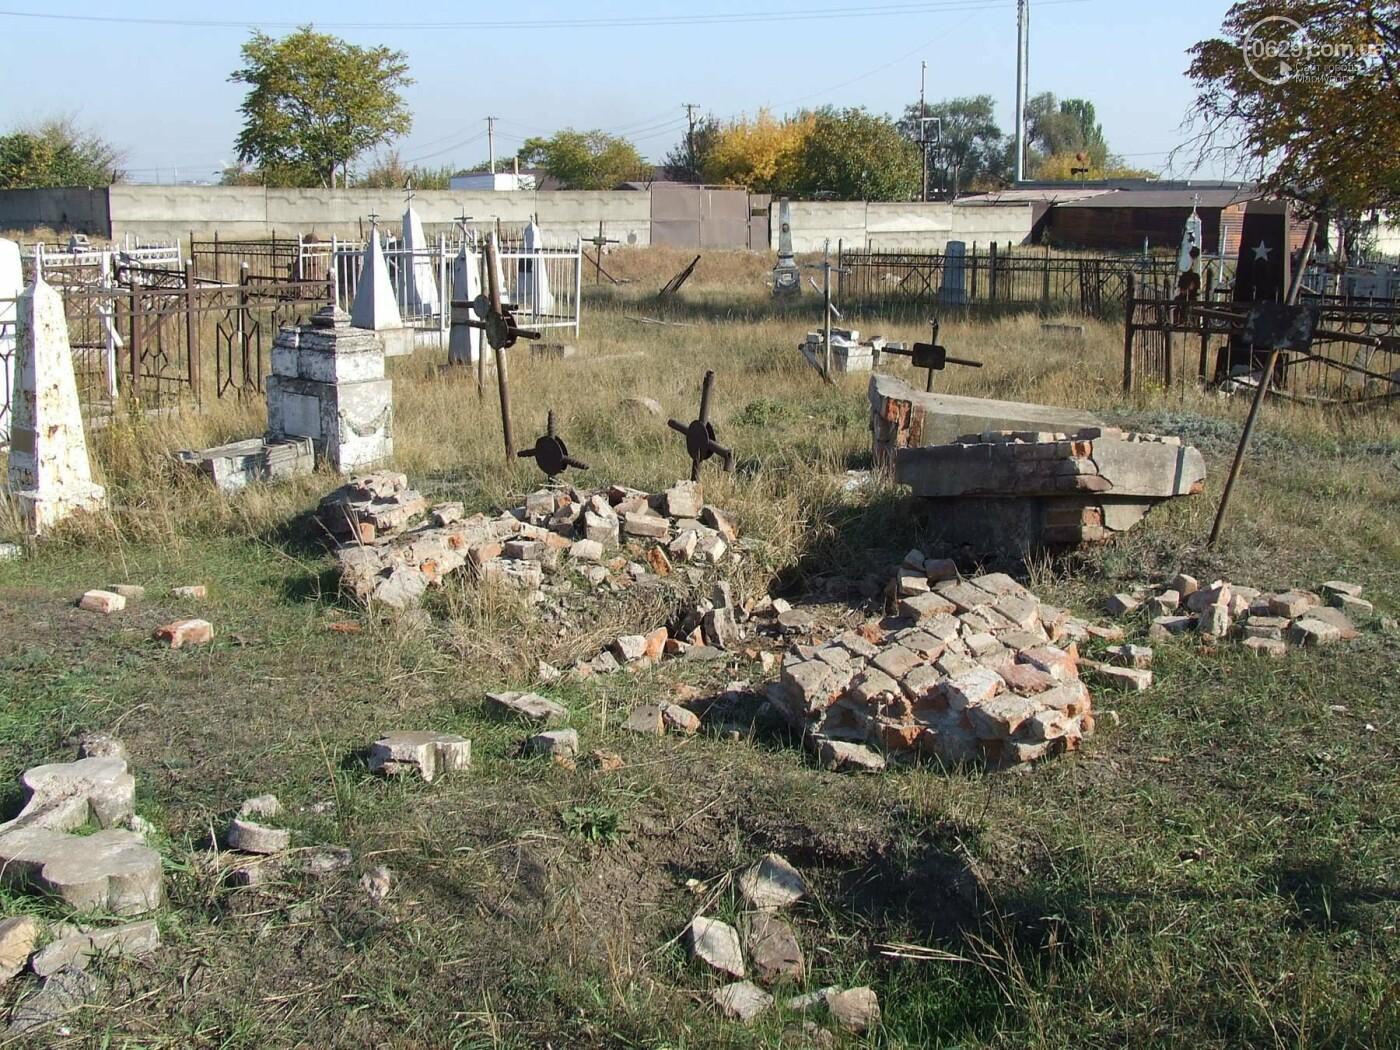 Вандалы разгромили могилы на самом старом кладбище Мариуполя, - ФОТО, фото-1